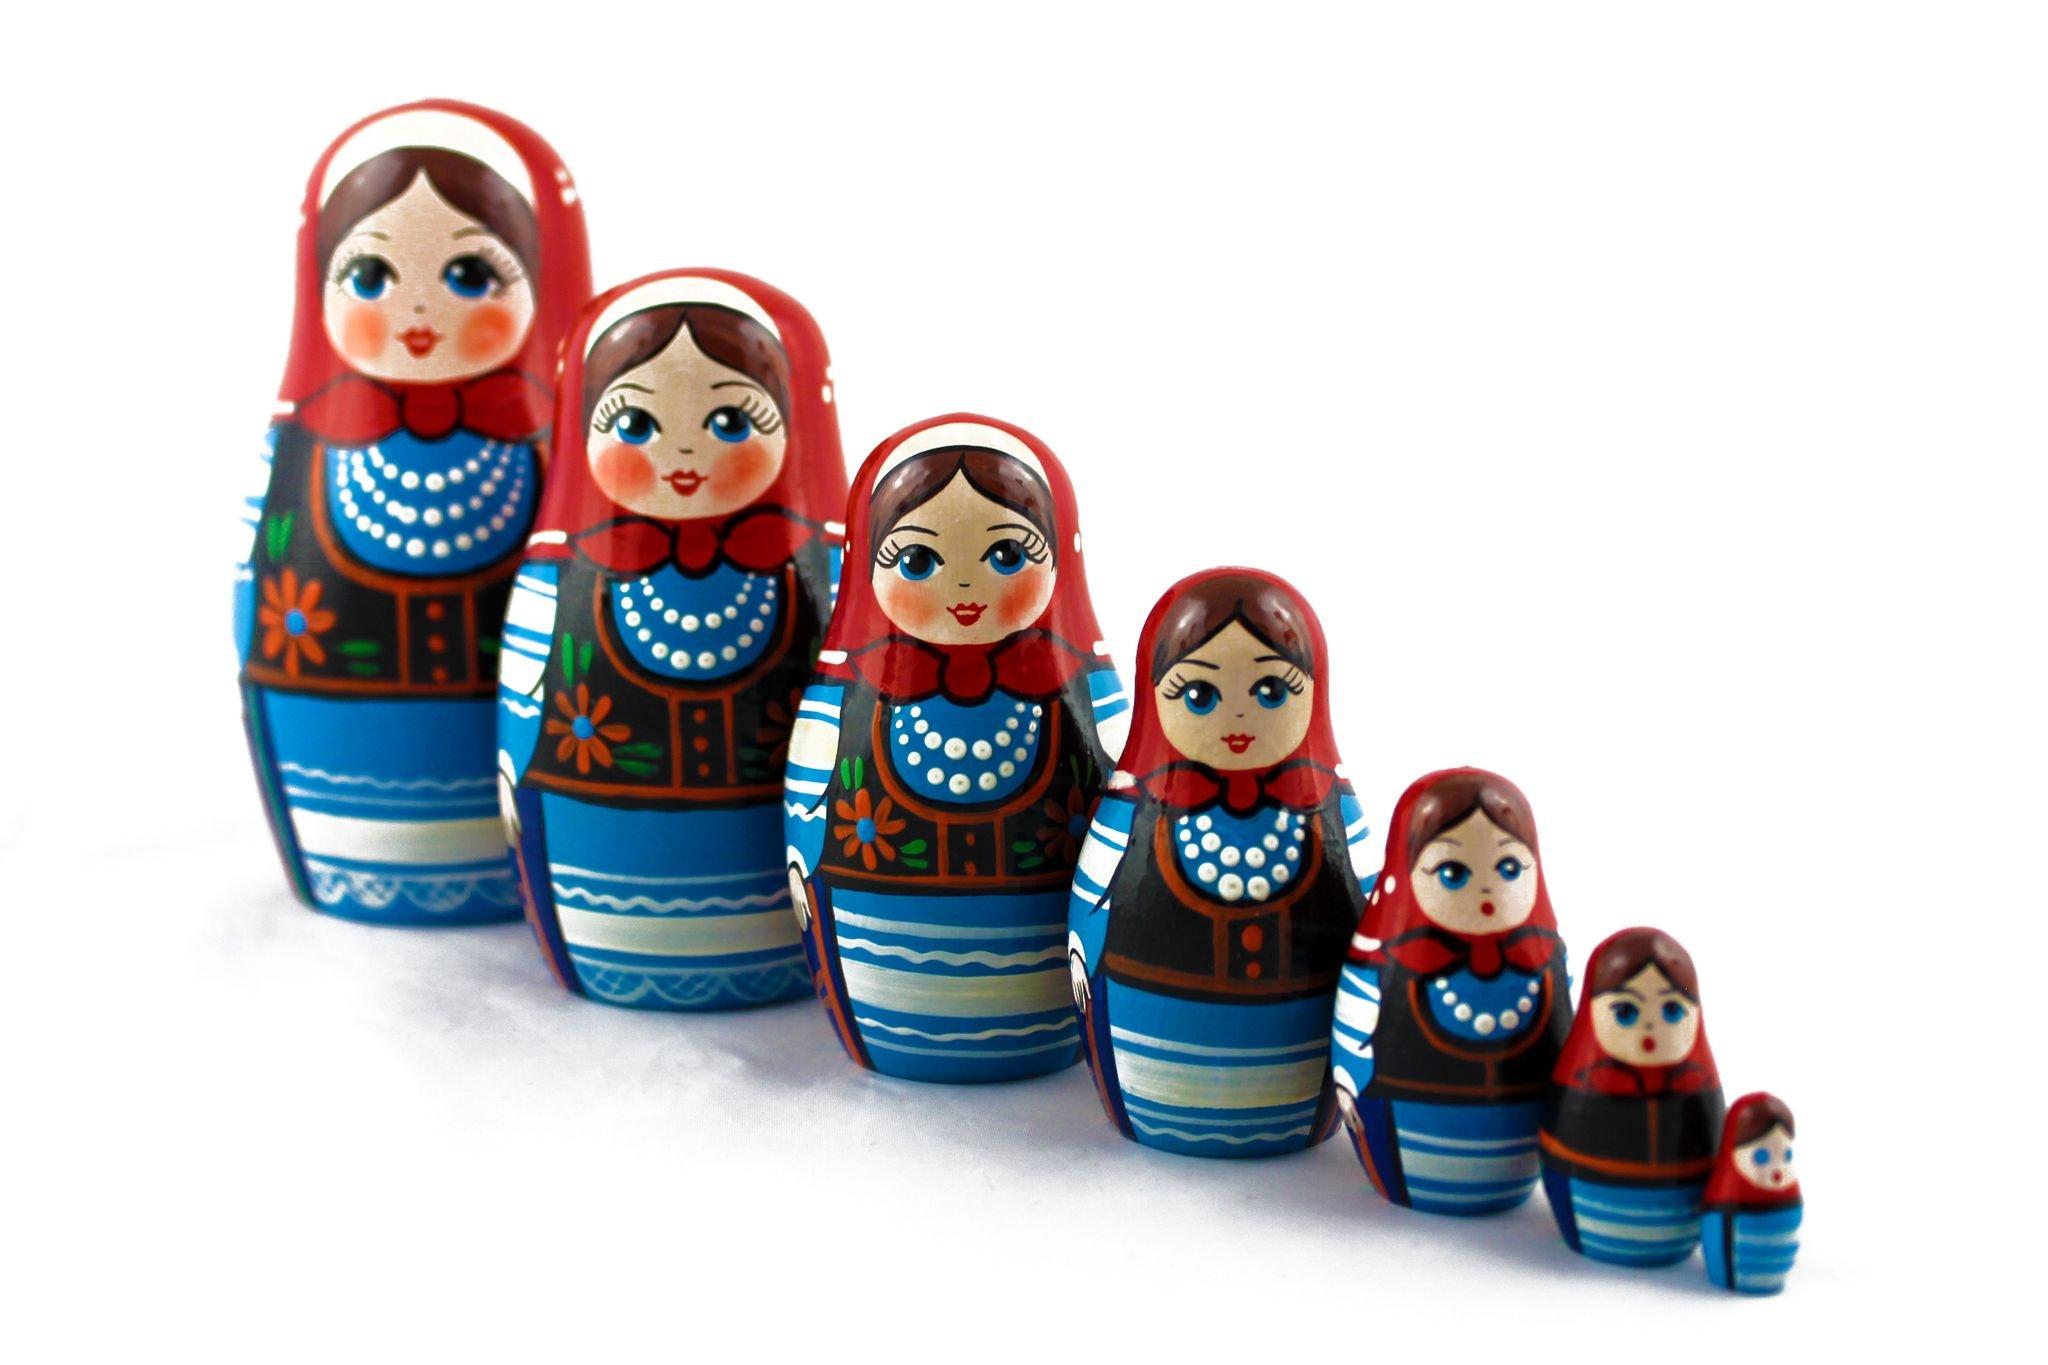 Matryoshka Polish National Dress Babushka Russian Nesting Wooden Stacking Doll 7 Pcs by MATRYOSHKA&HANDICRAFT (Image #8)